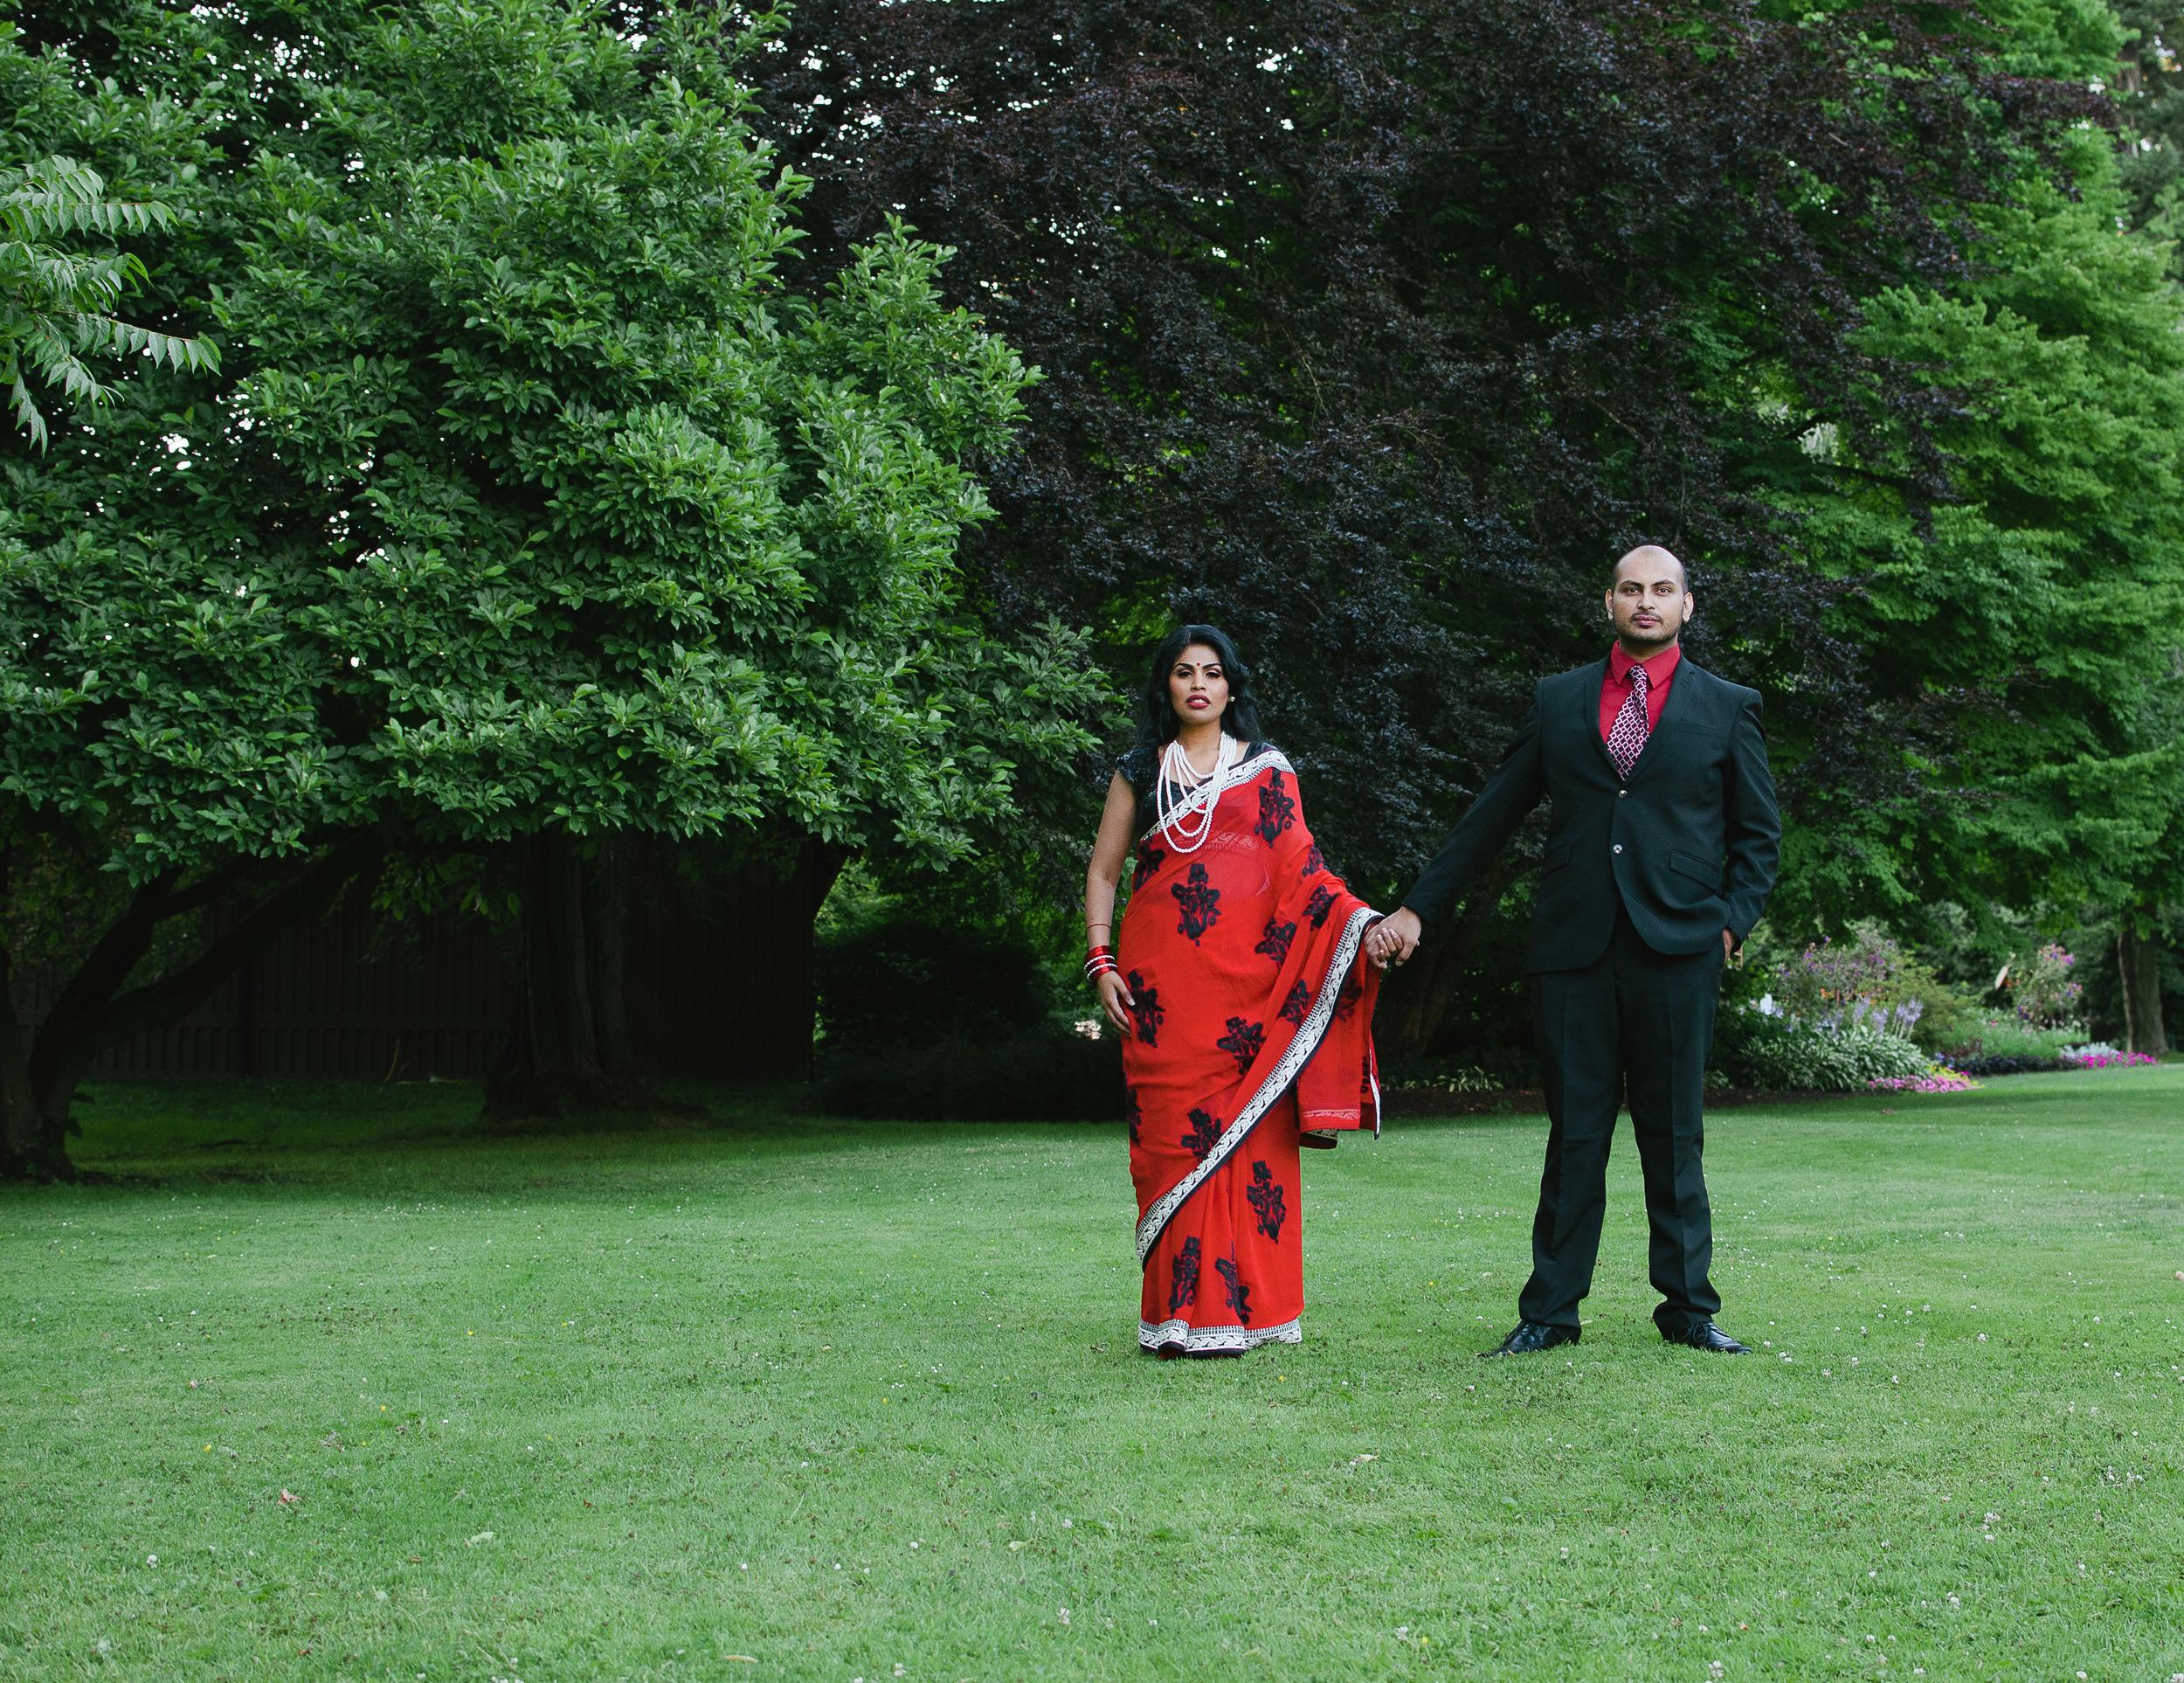 Amresh + Salona_Katie Powell Photography Vancouver Engagement Stanley Park Portraits-13.jpg